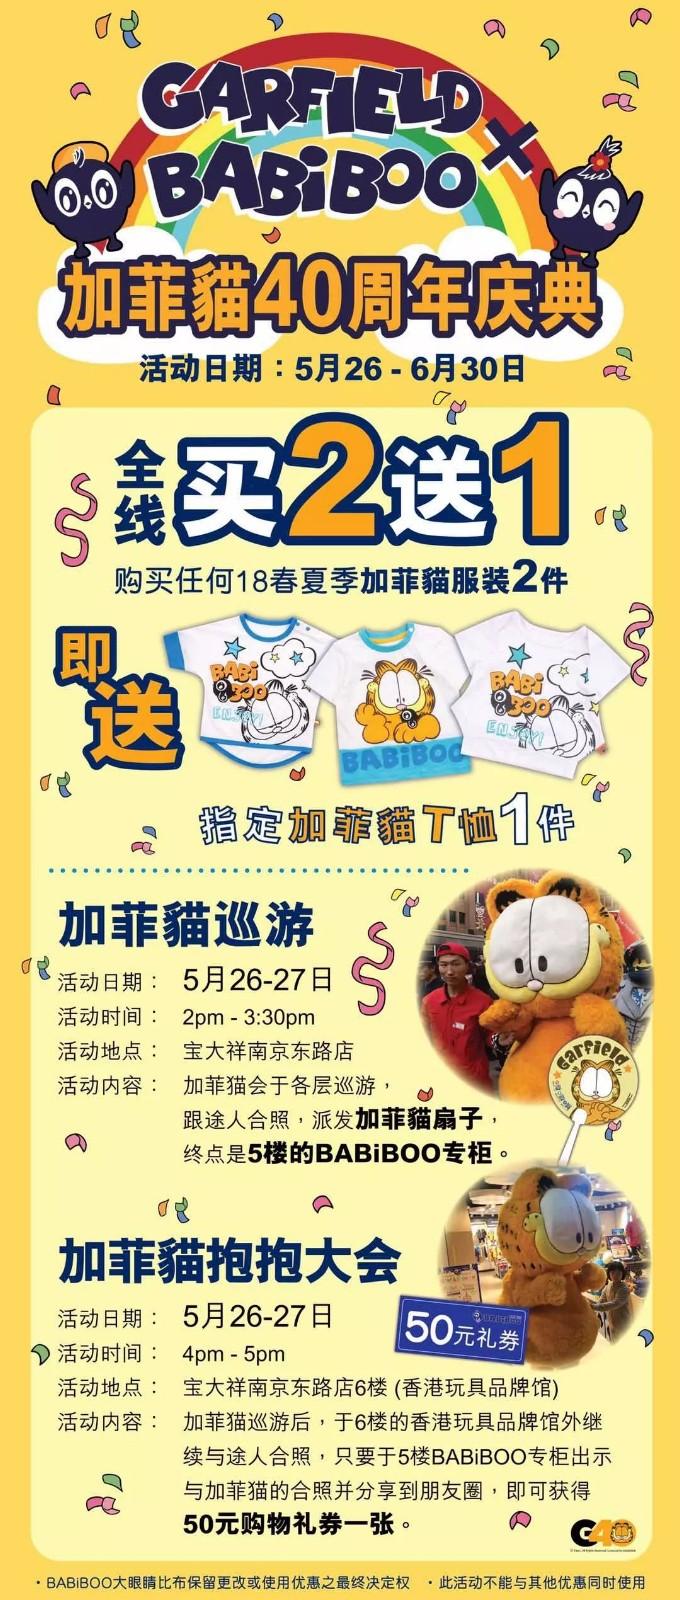 High 翻全场!BABiBOO庆祝加菲猫40周年活动!